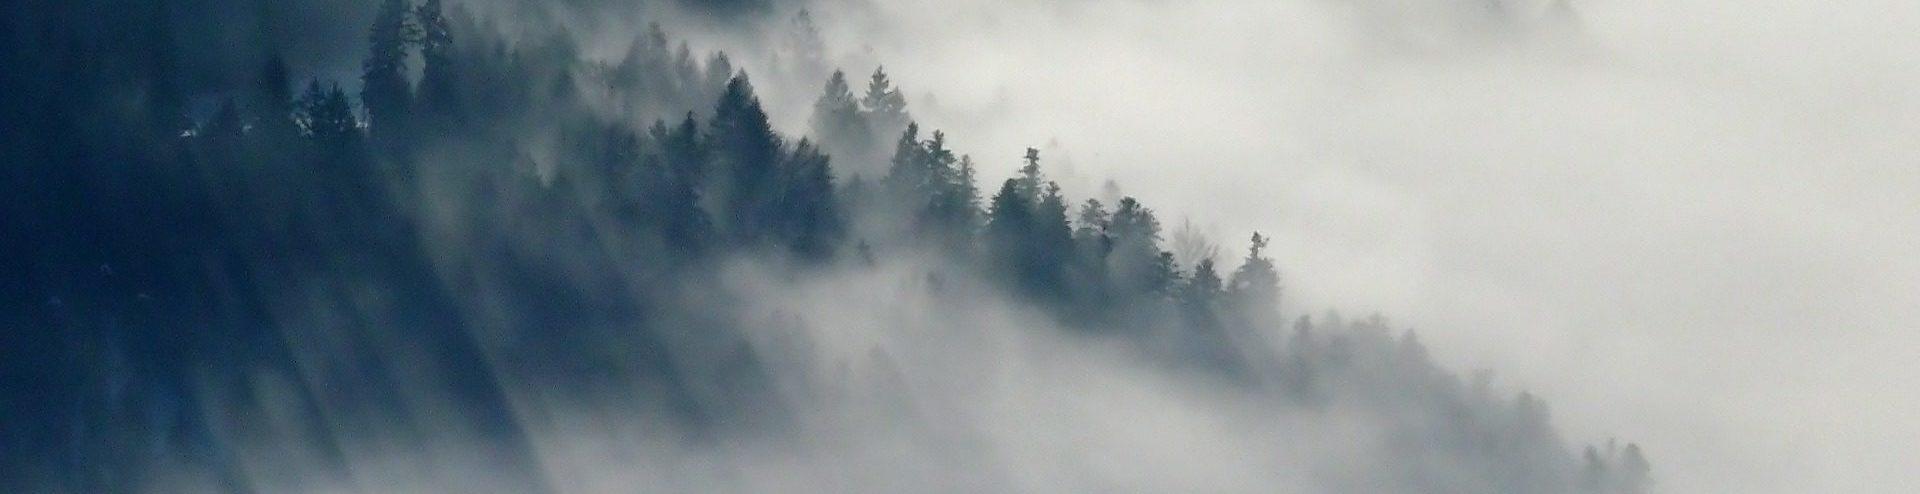 Wald, Bäume, Holz